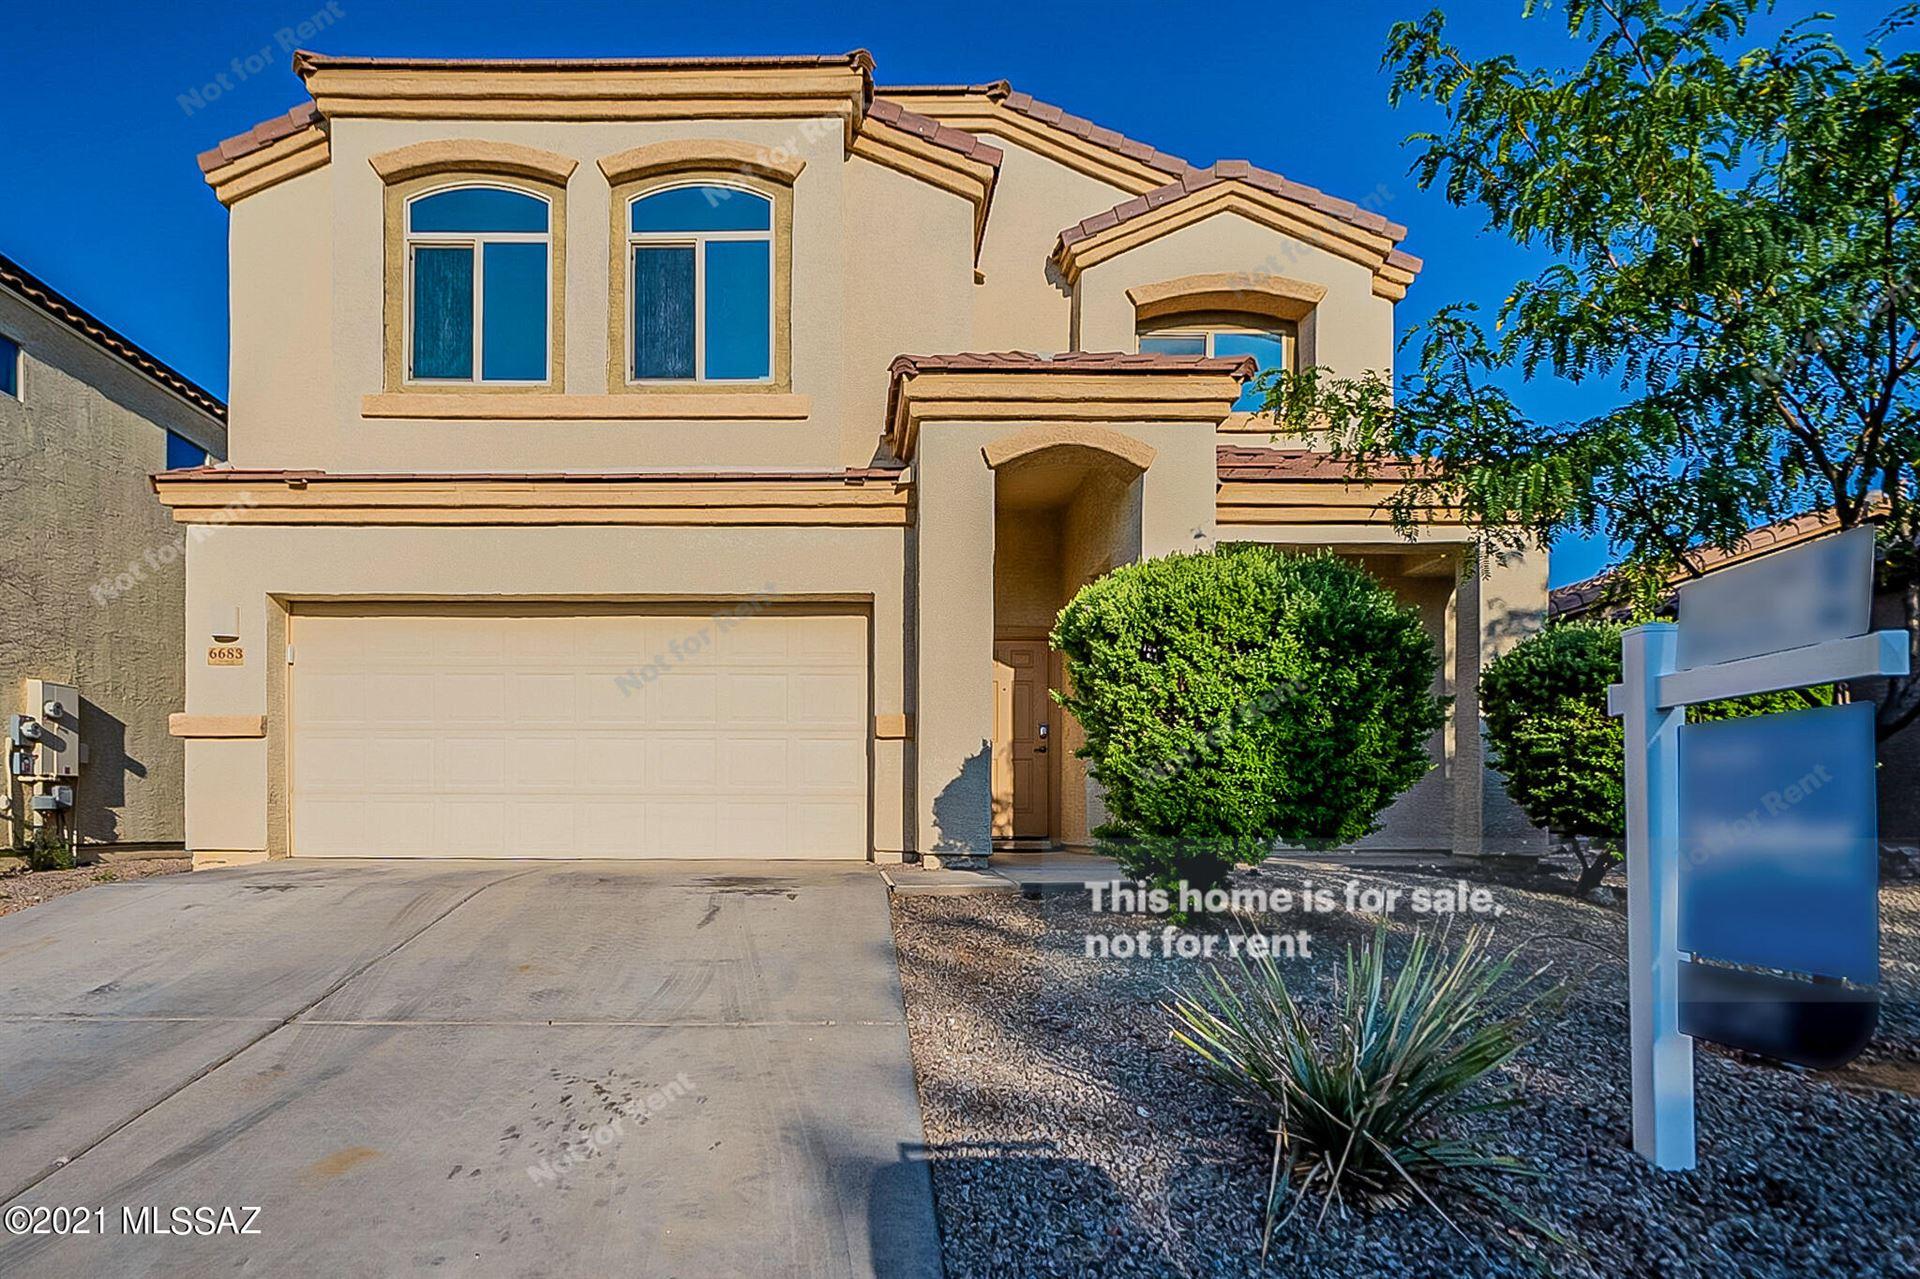 6683 S Blue Wing Drive, Tucson, AZ 85757 - MLS#: 22123971